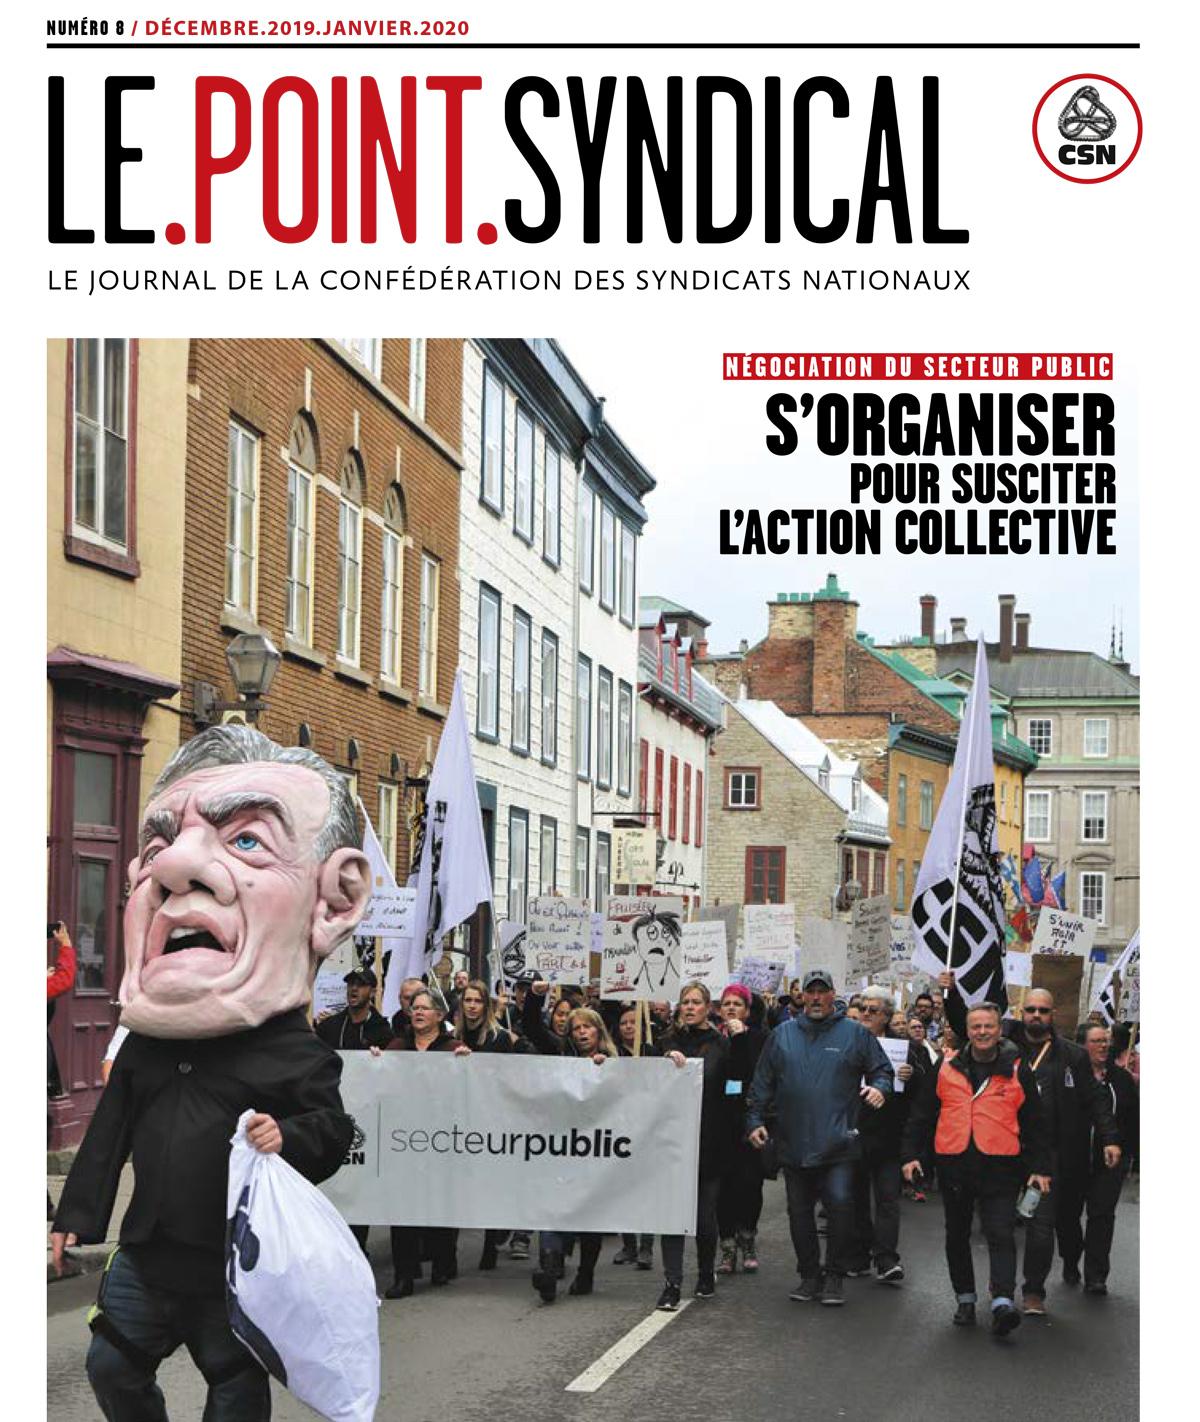 Le Point Syndical Numéro 8